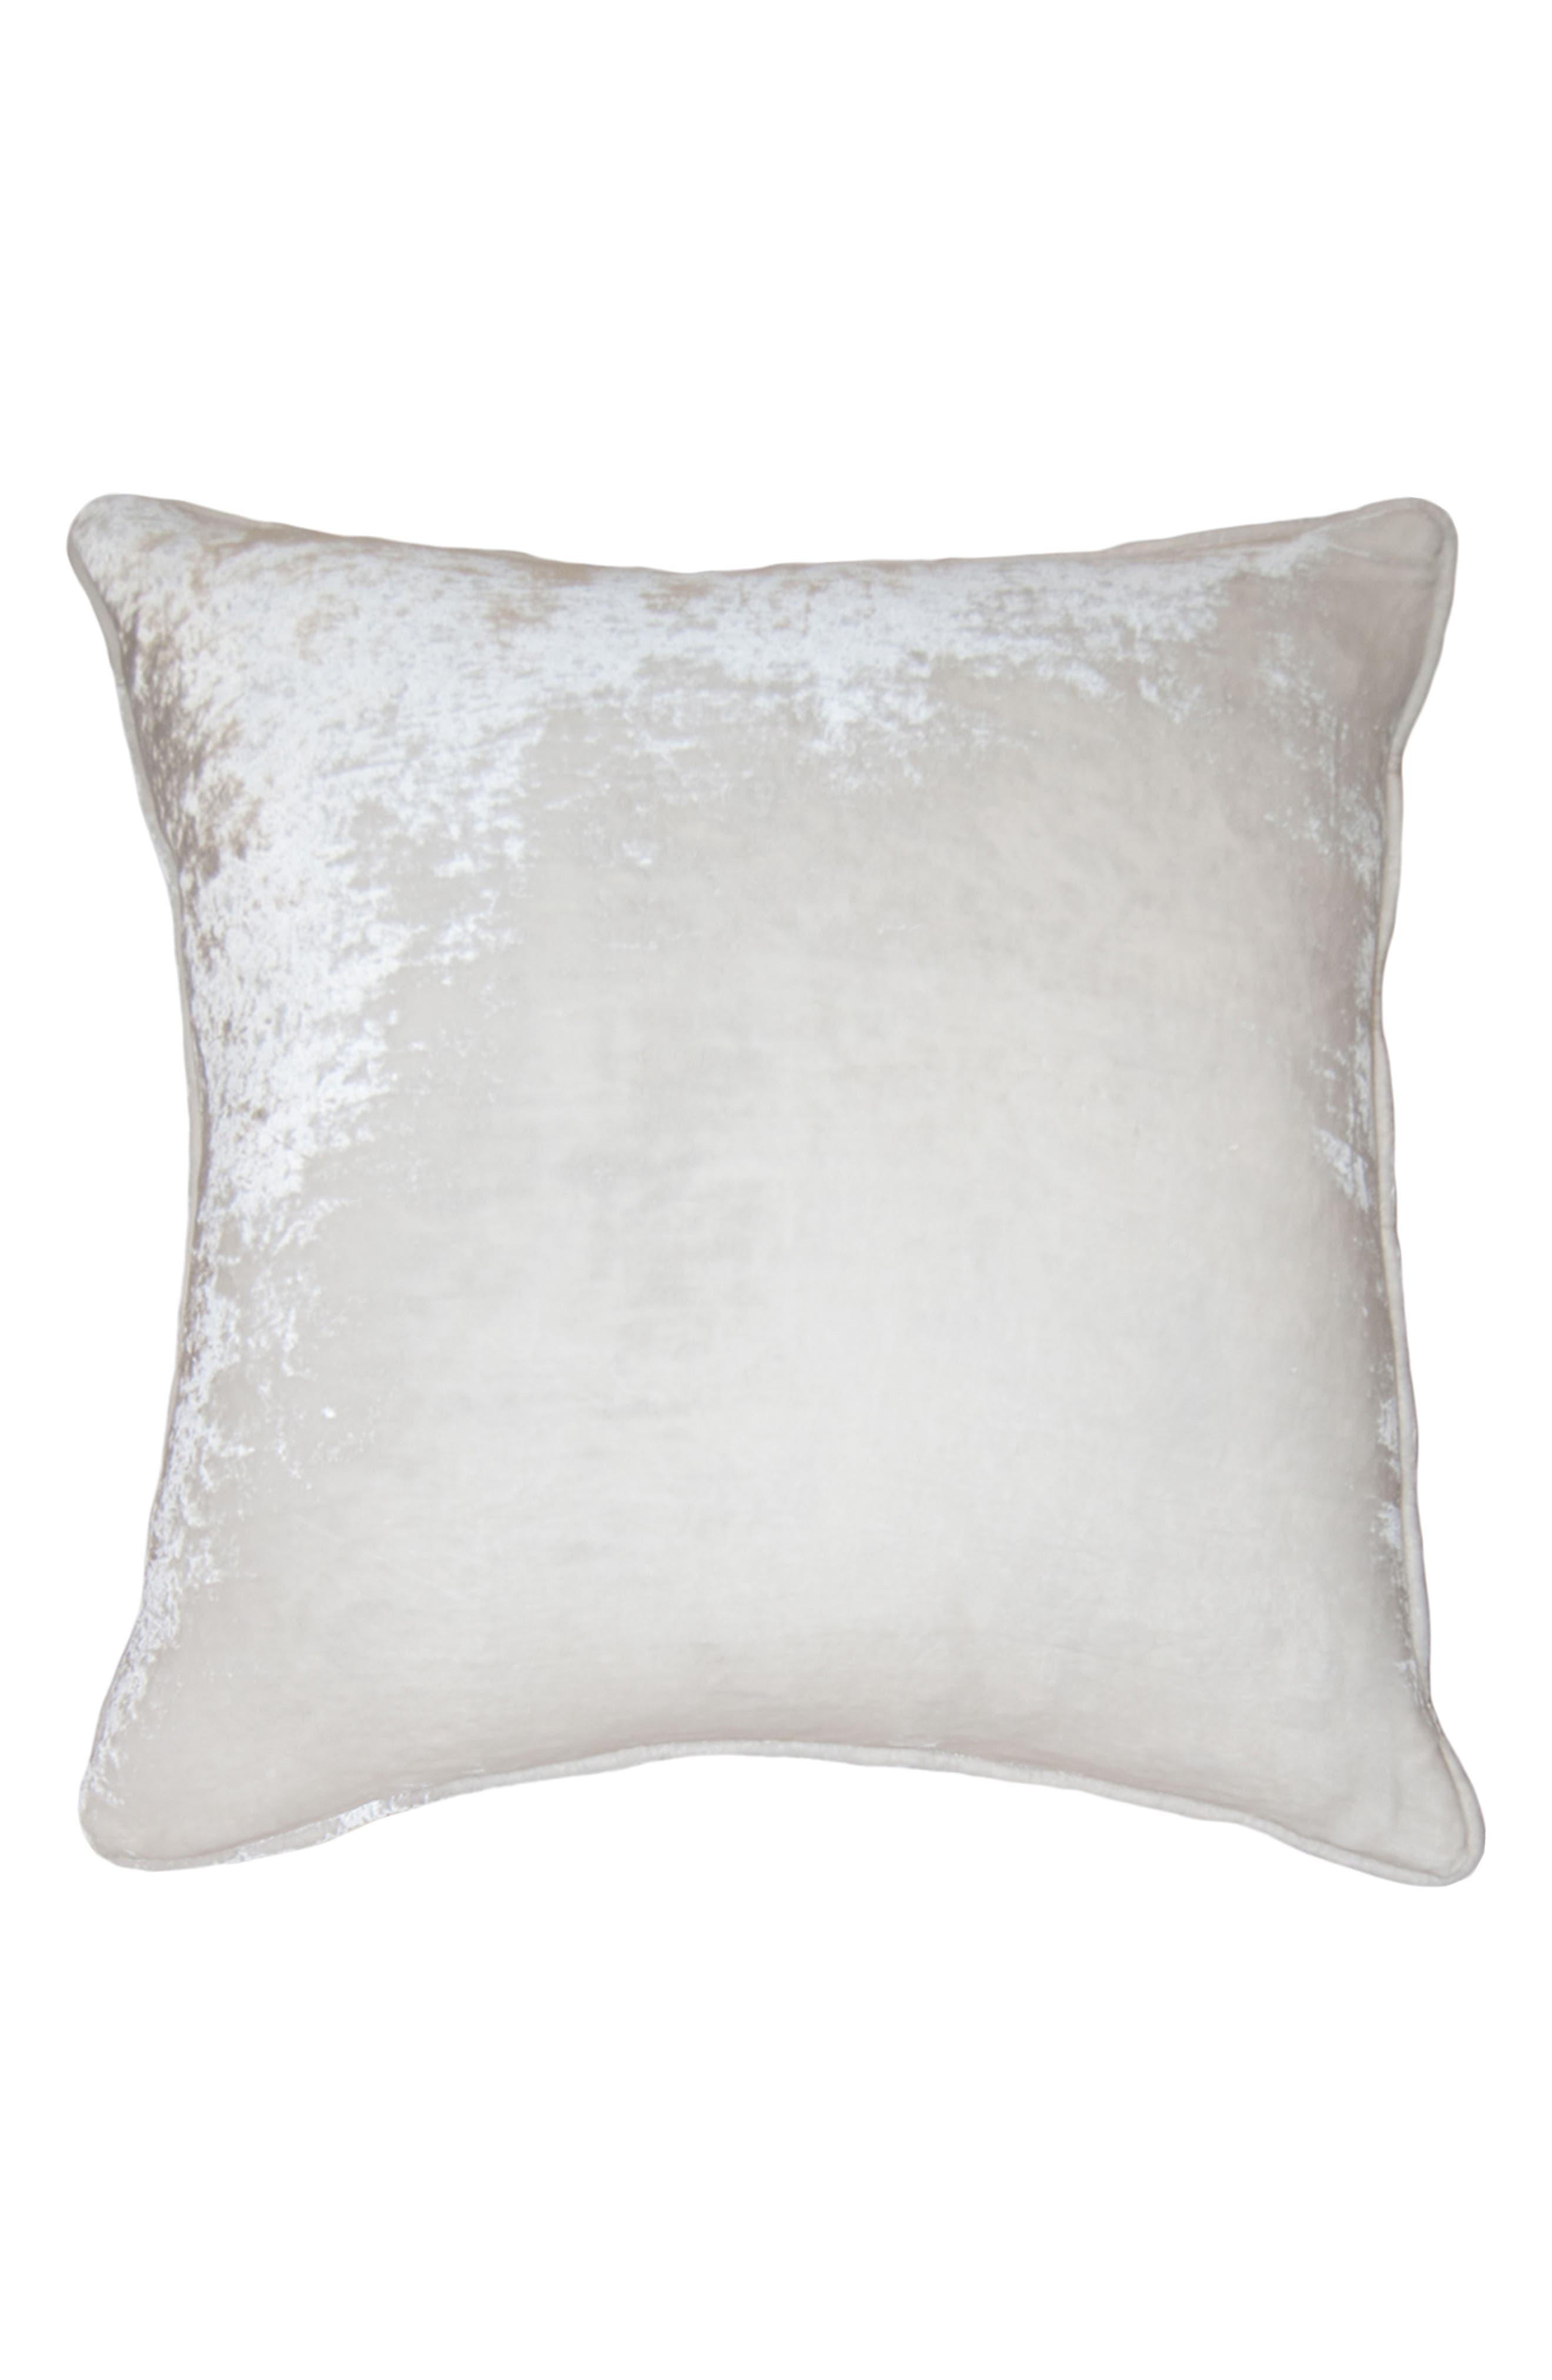 Square Feathers Velvet Accent Pillow